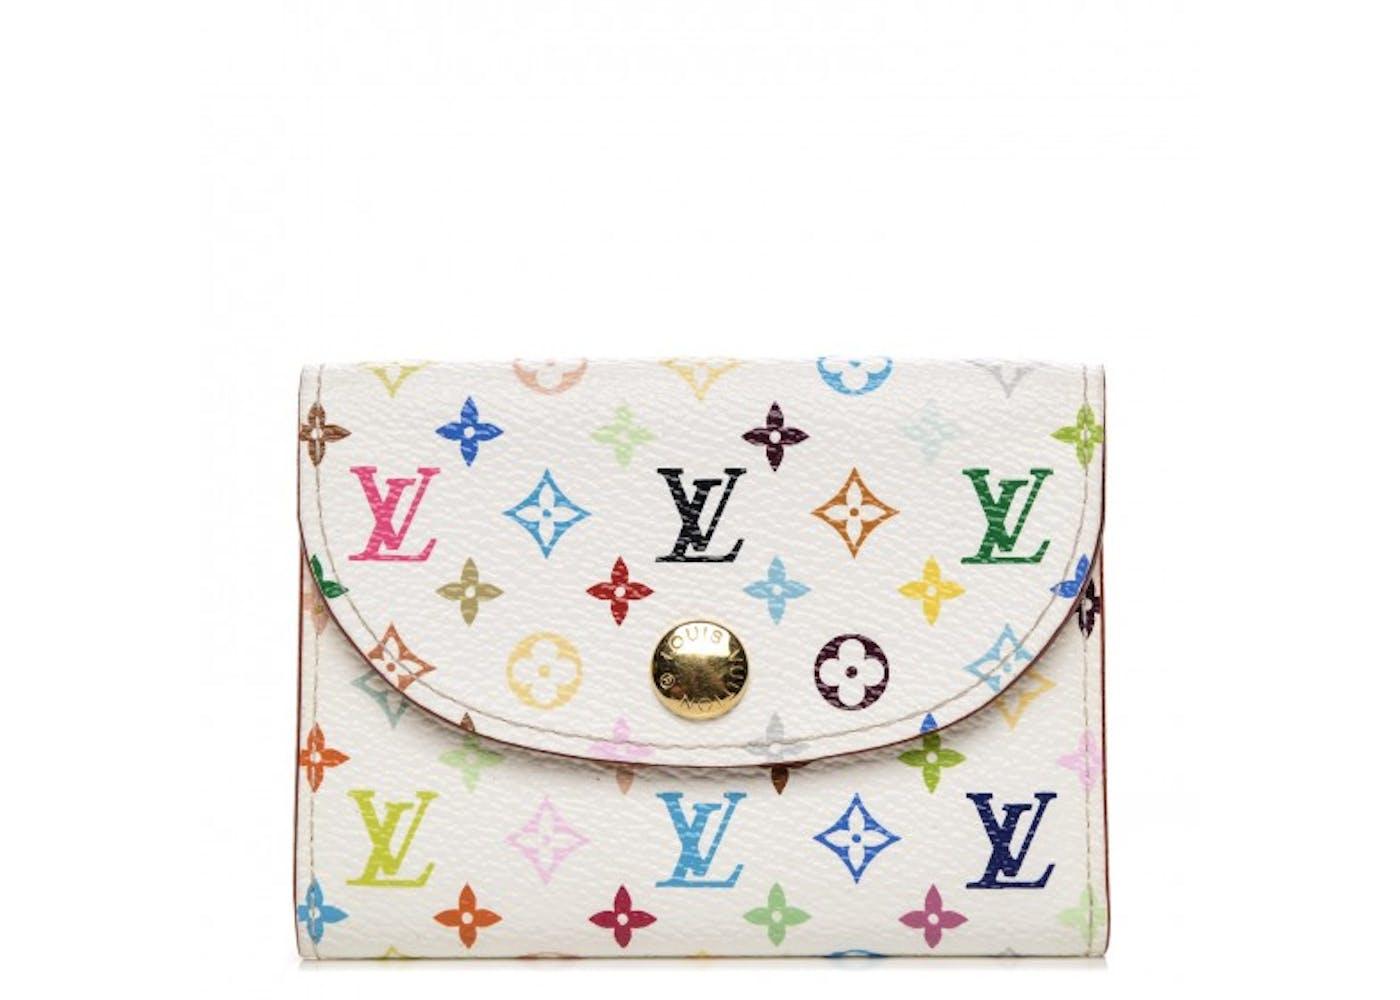 Vuitton flap business card holder monogram multicolor louis vuitton flap business card holder monogram multicolor magicingreecefo Images